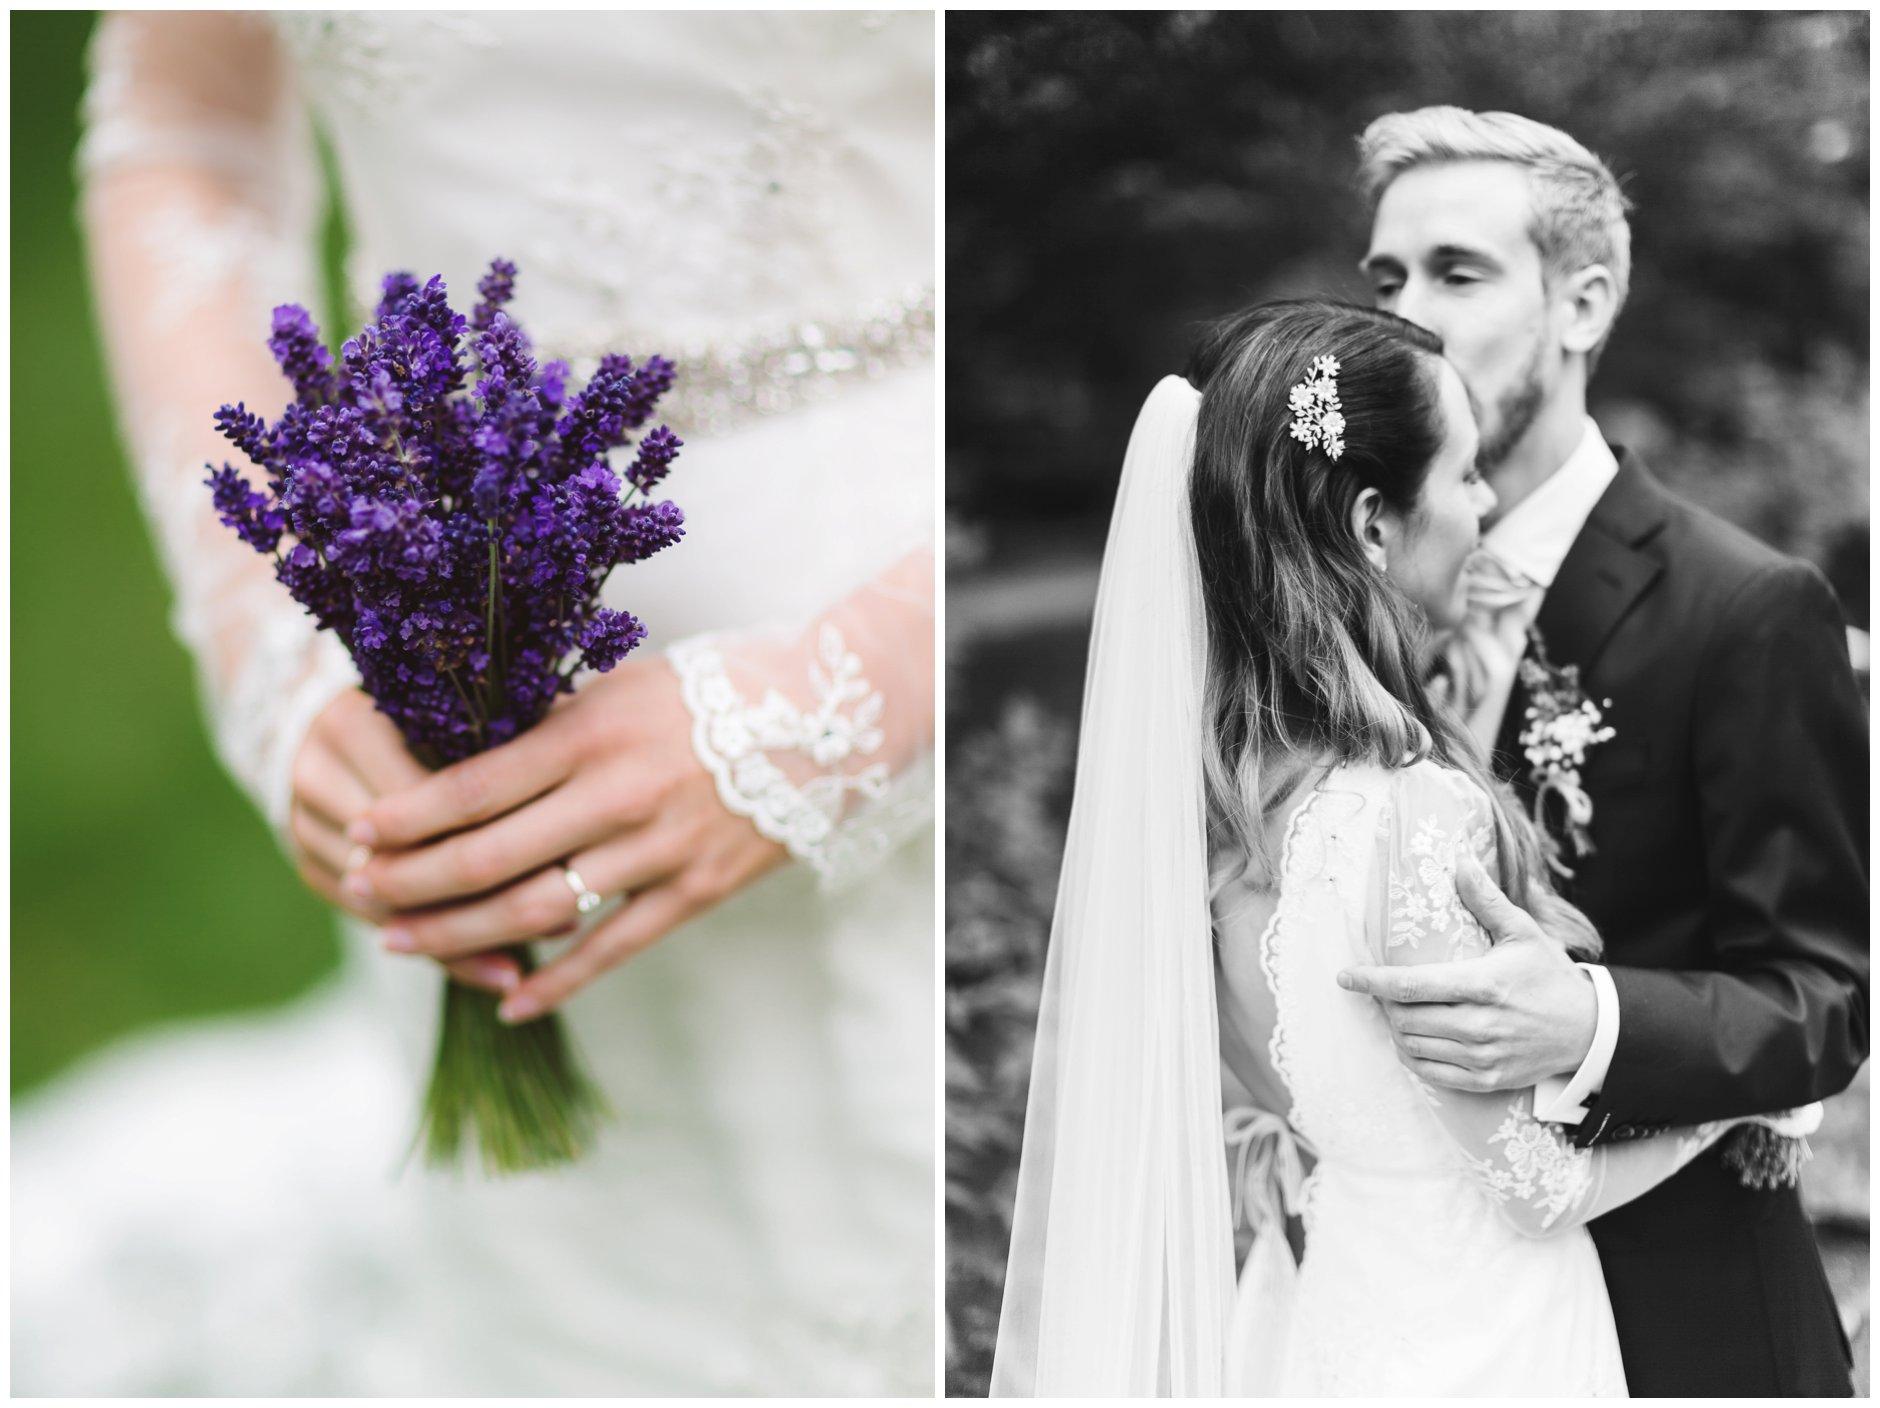 Fotograf-Eline-Jacobine-chic-vintage-brud-lavendel-brudebukett-langermet-brudekjole